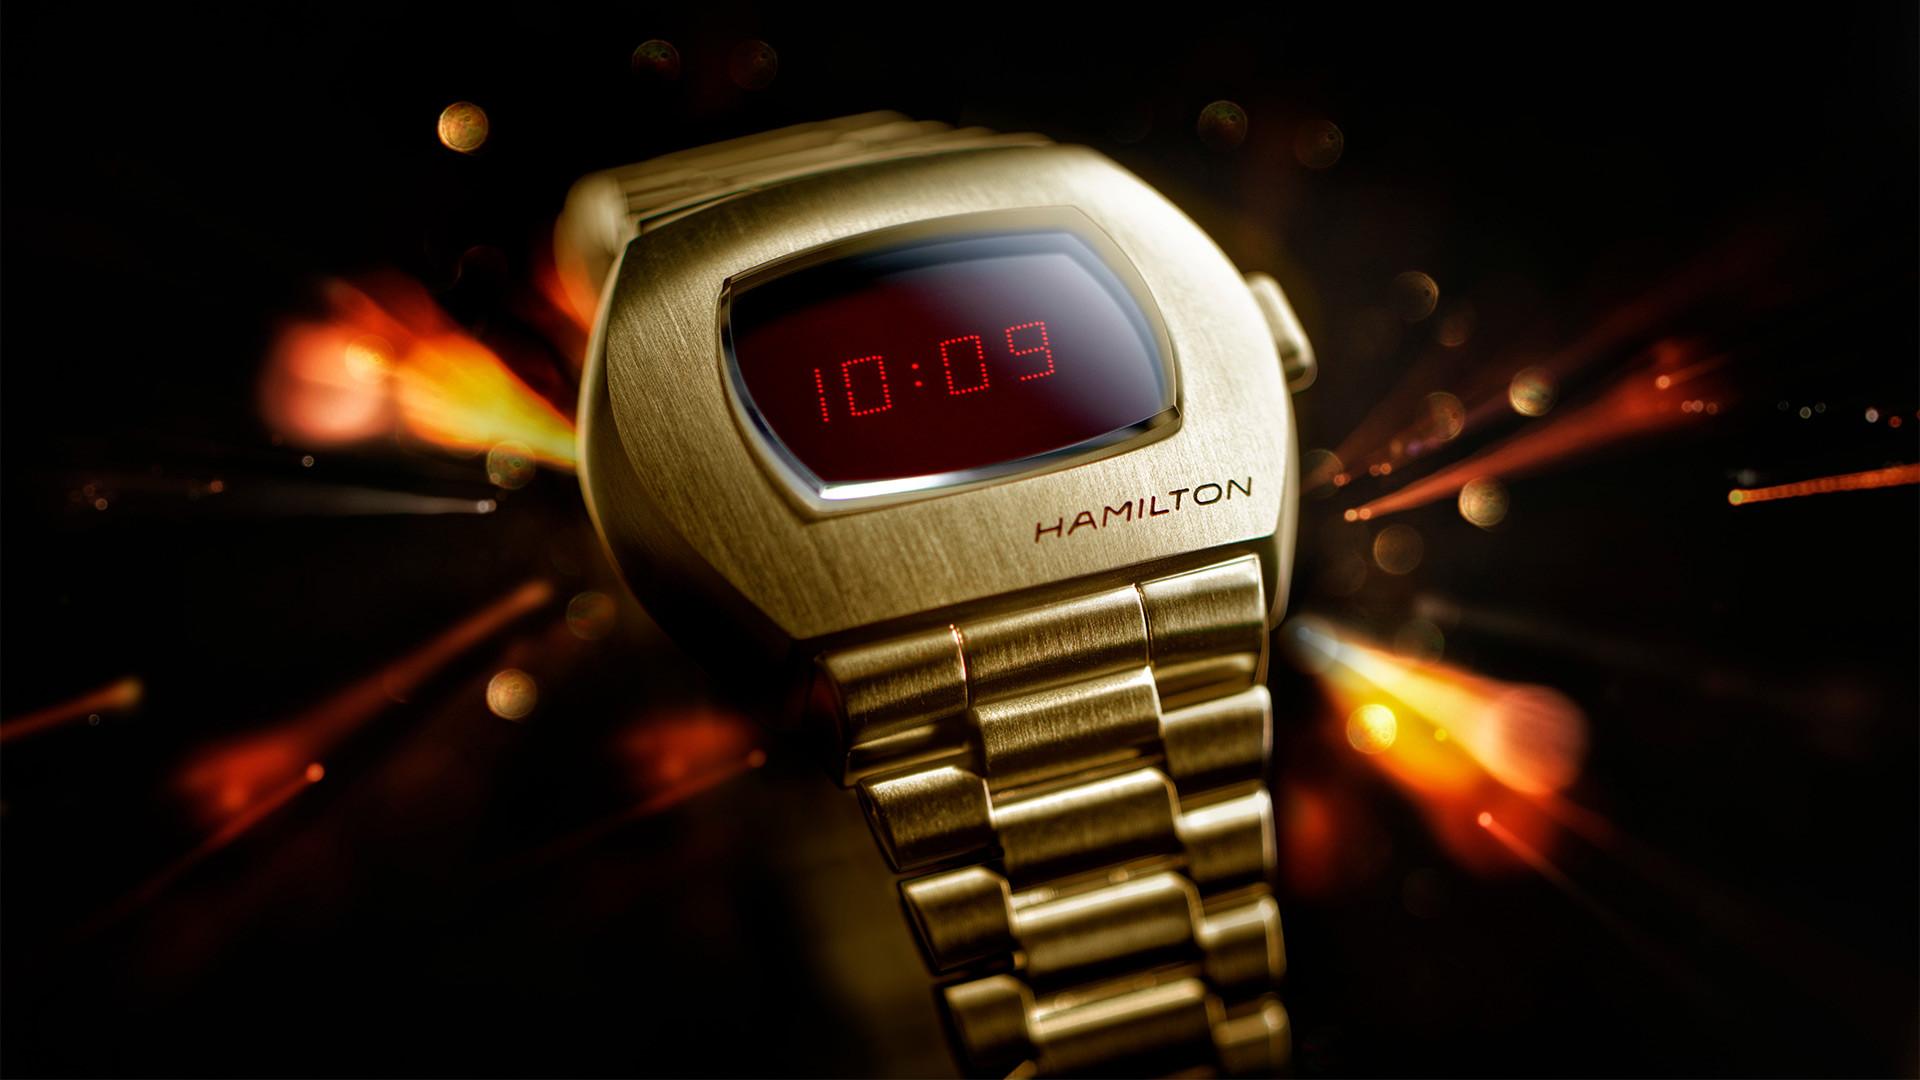 Hamilton PSR watch review